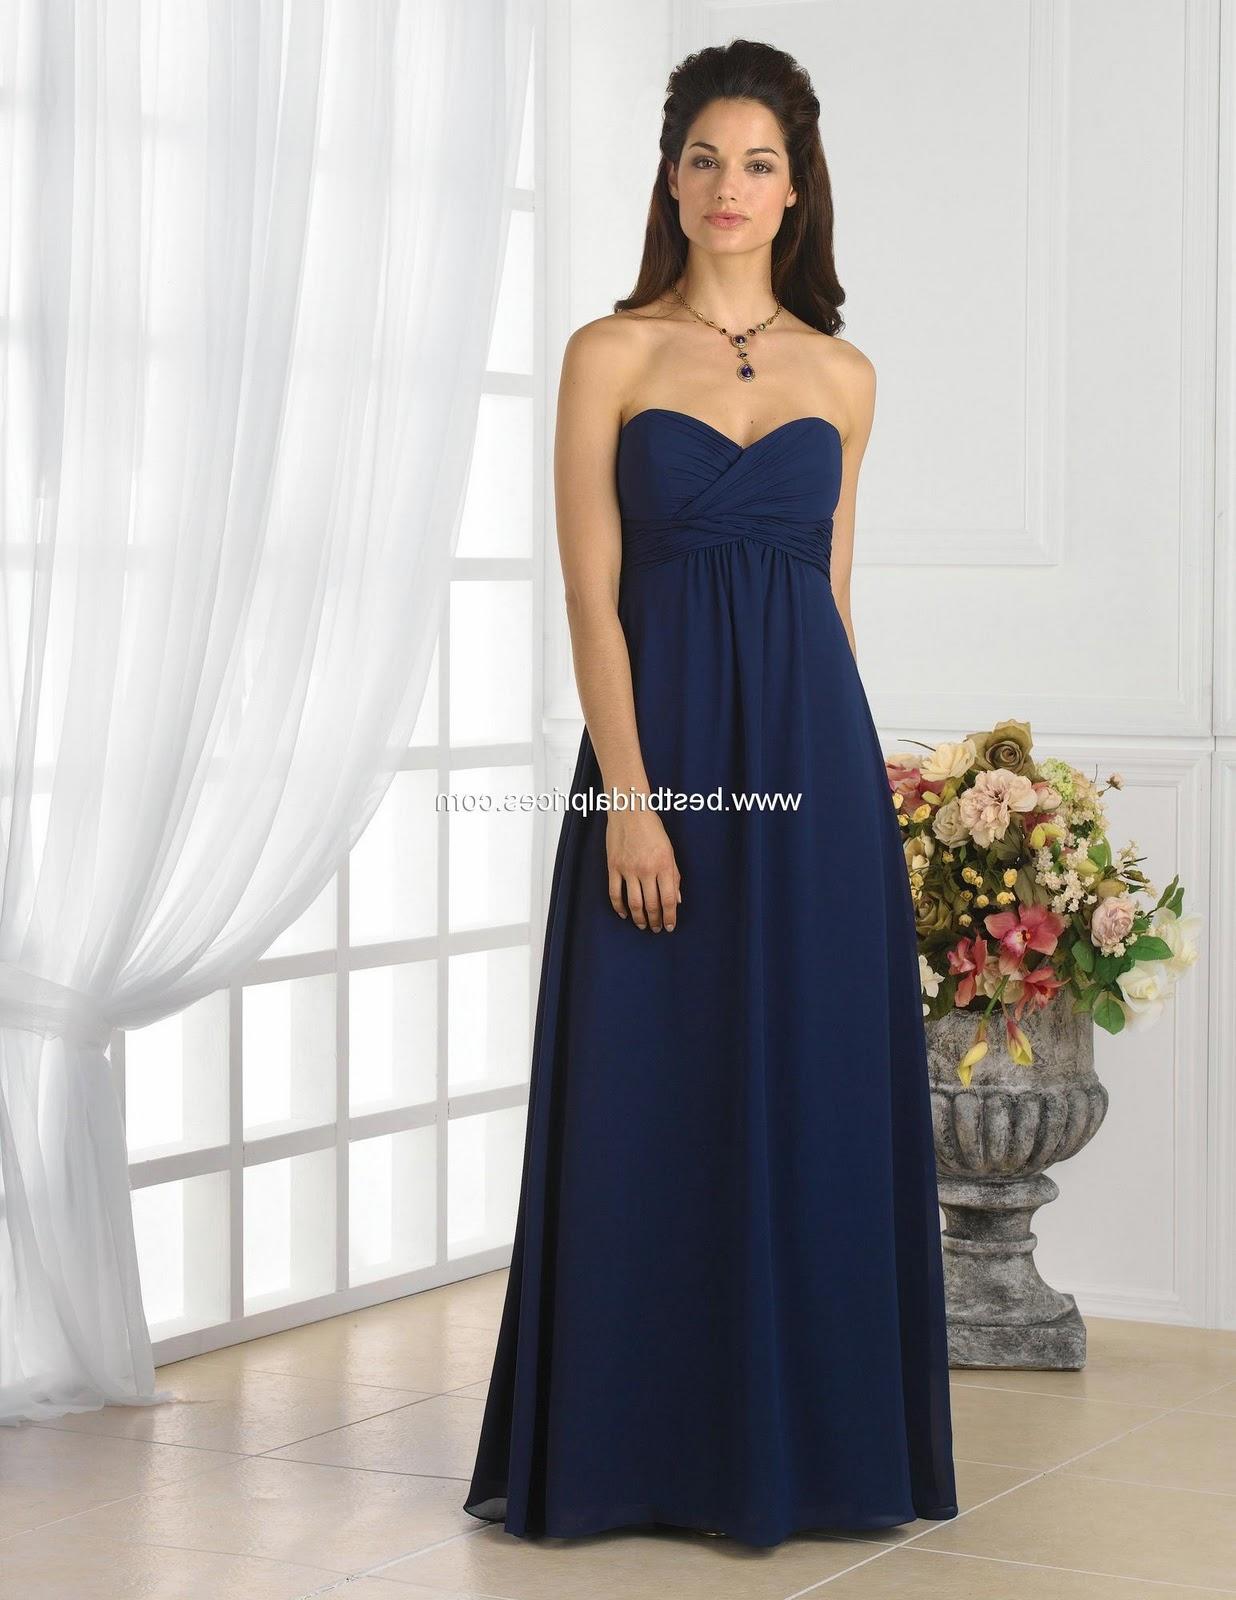 180.00 : Wedding Dresses